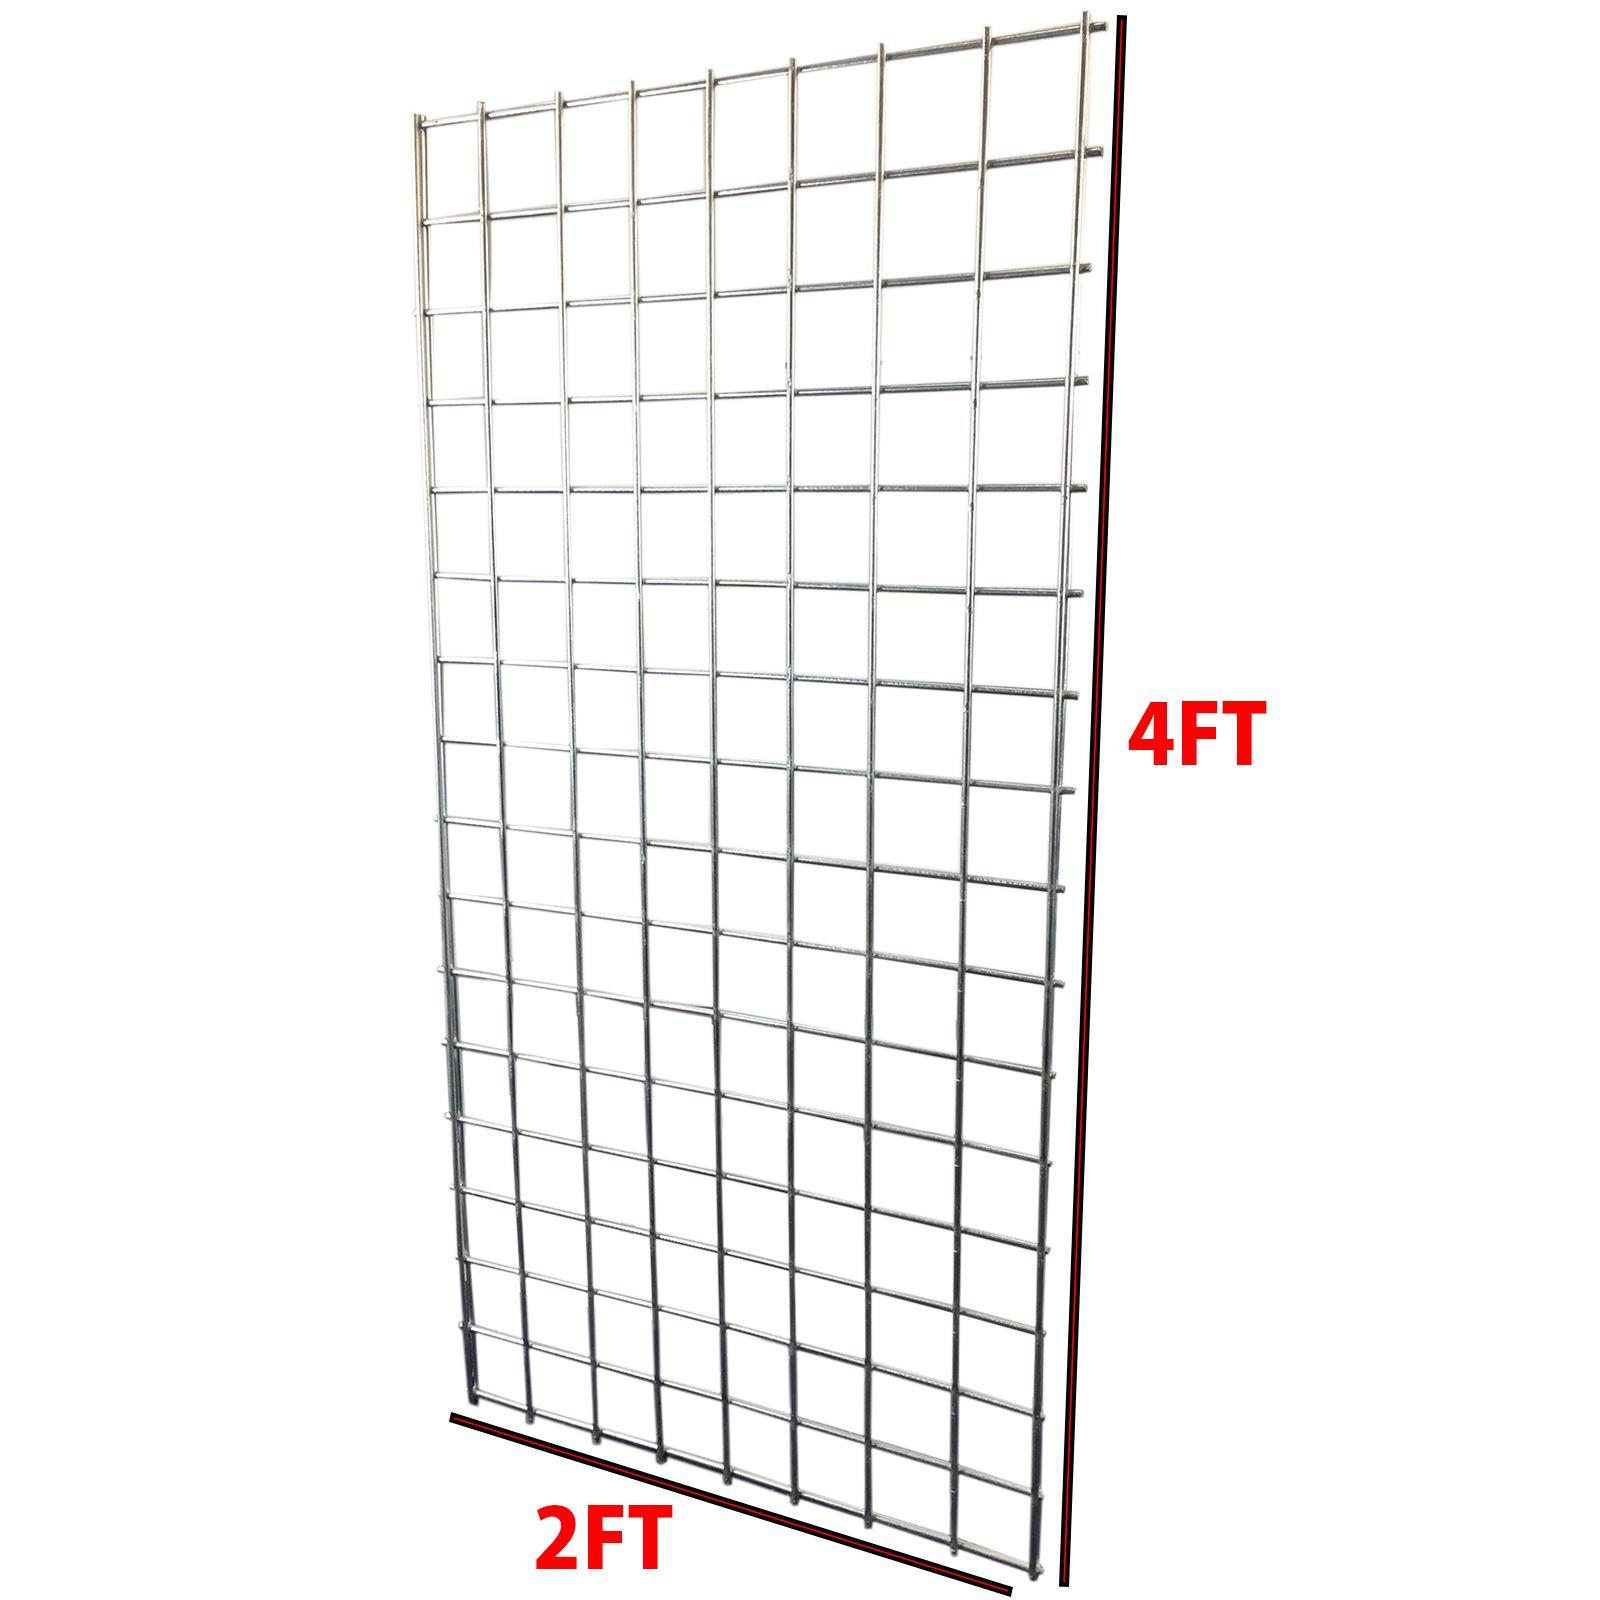 4ft X 2ft Heavy Duty Grid Wall Gridwall Mesh Steel Display